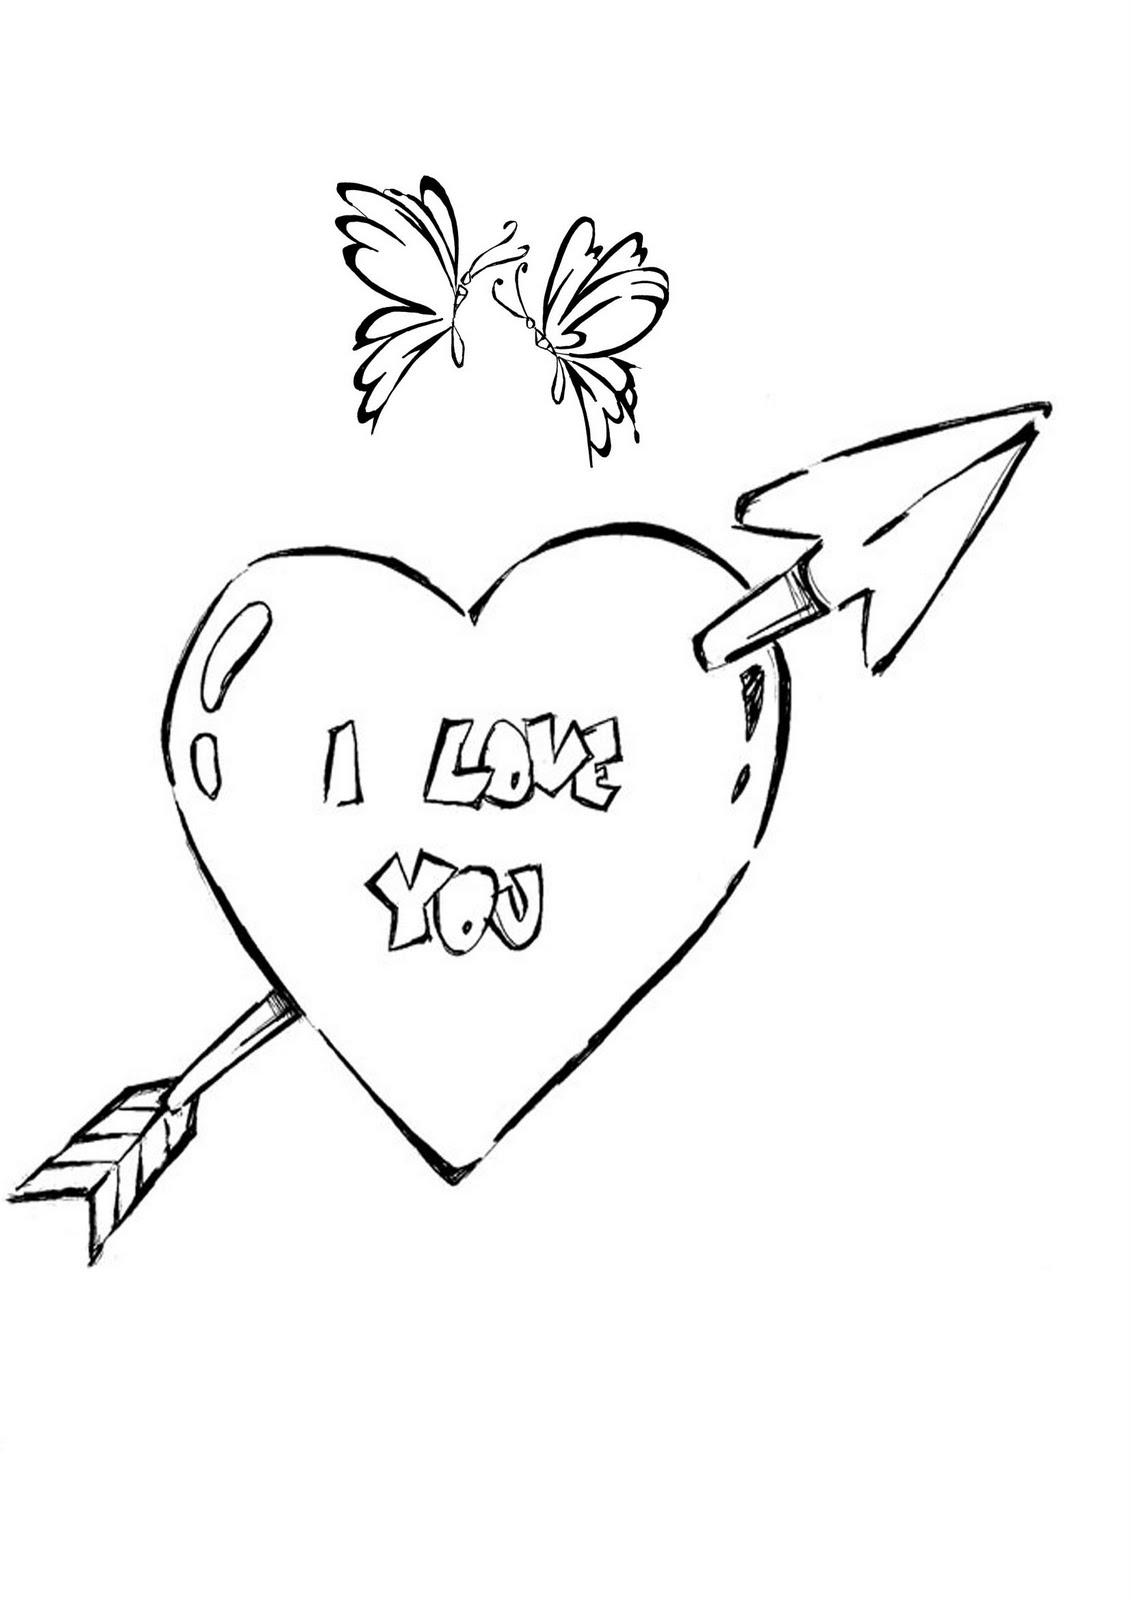 http://1.bp.blogspot.com/_JB1MBJfZNw4/TJJaHTDfoZI/AAAAAAAAFiM/PQH-MoN_FfA/s1600/desenho+de+coracao+para+colorir.jpg